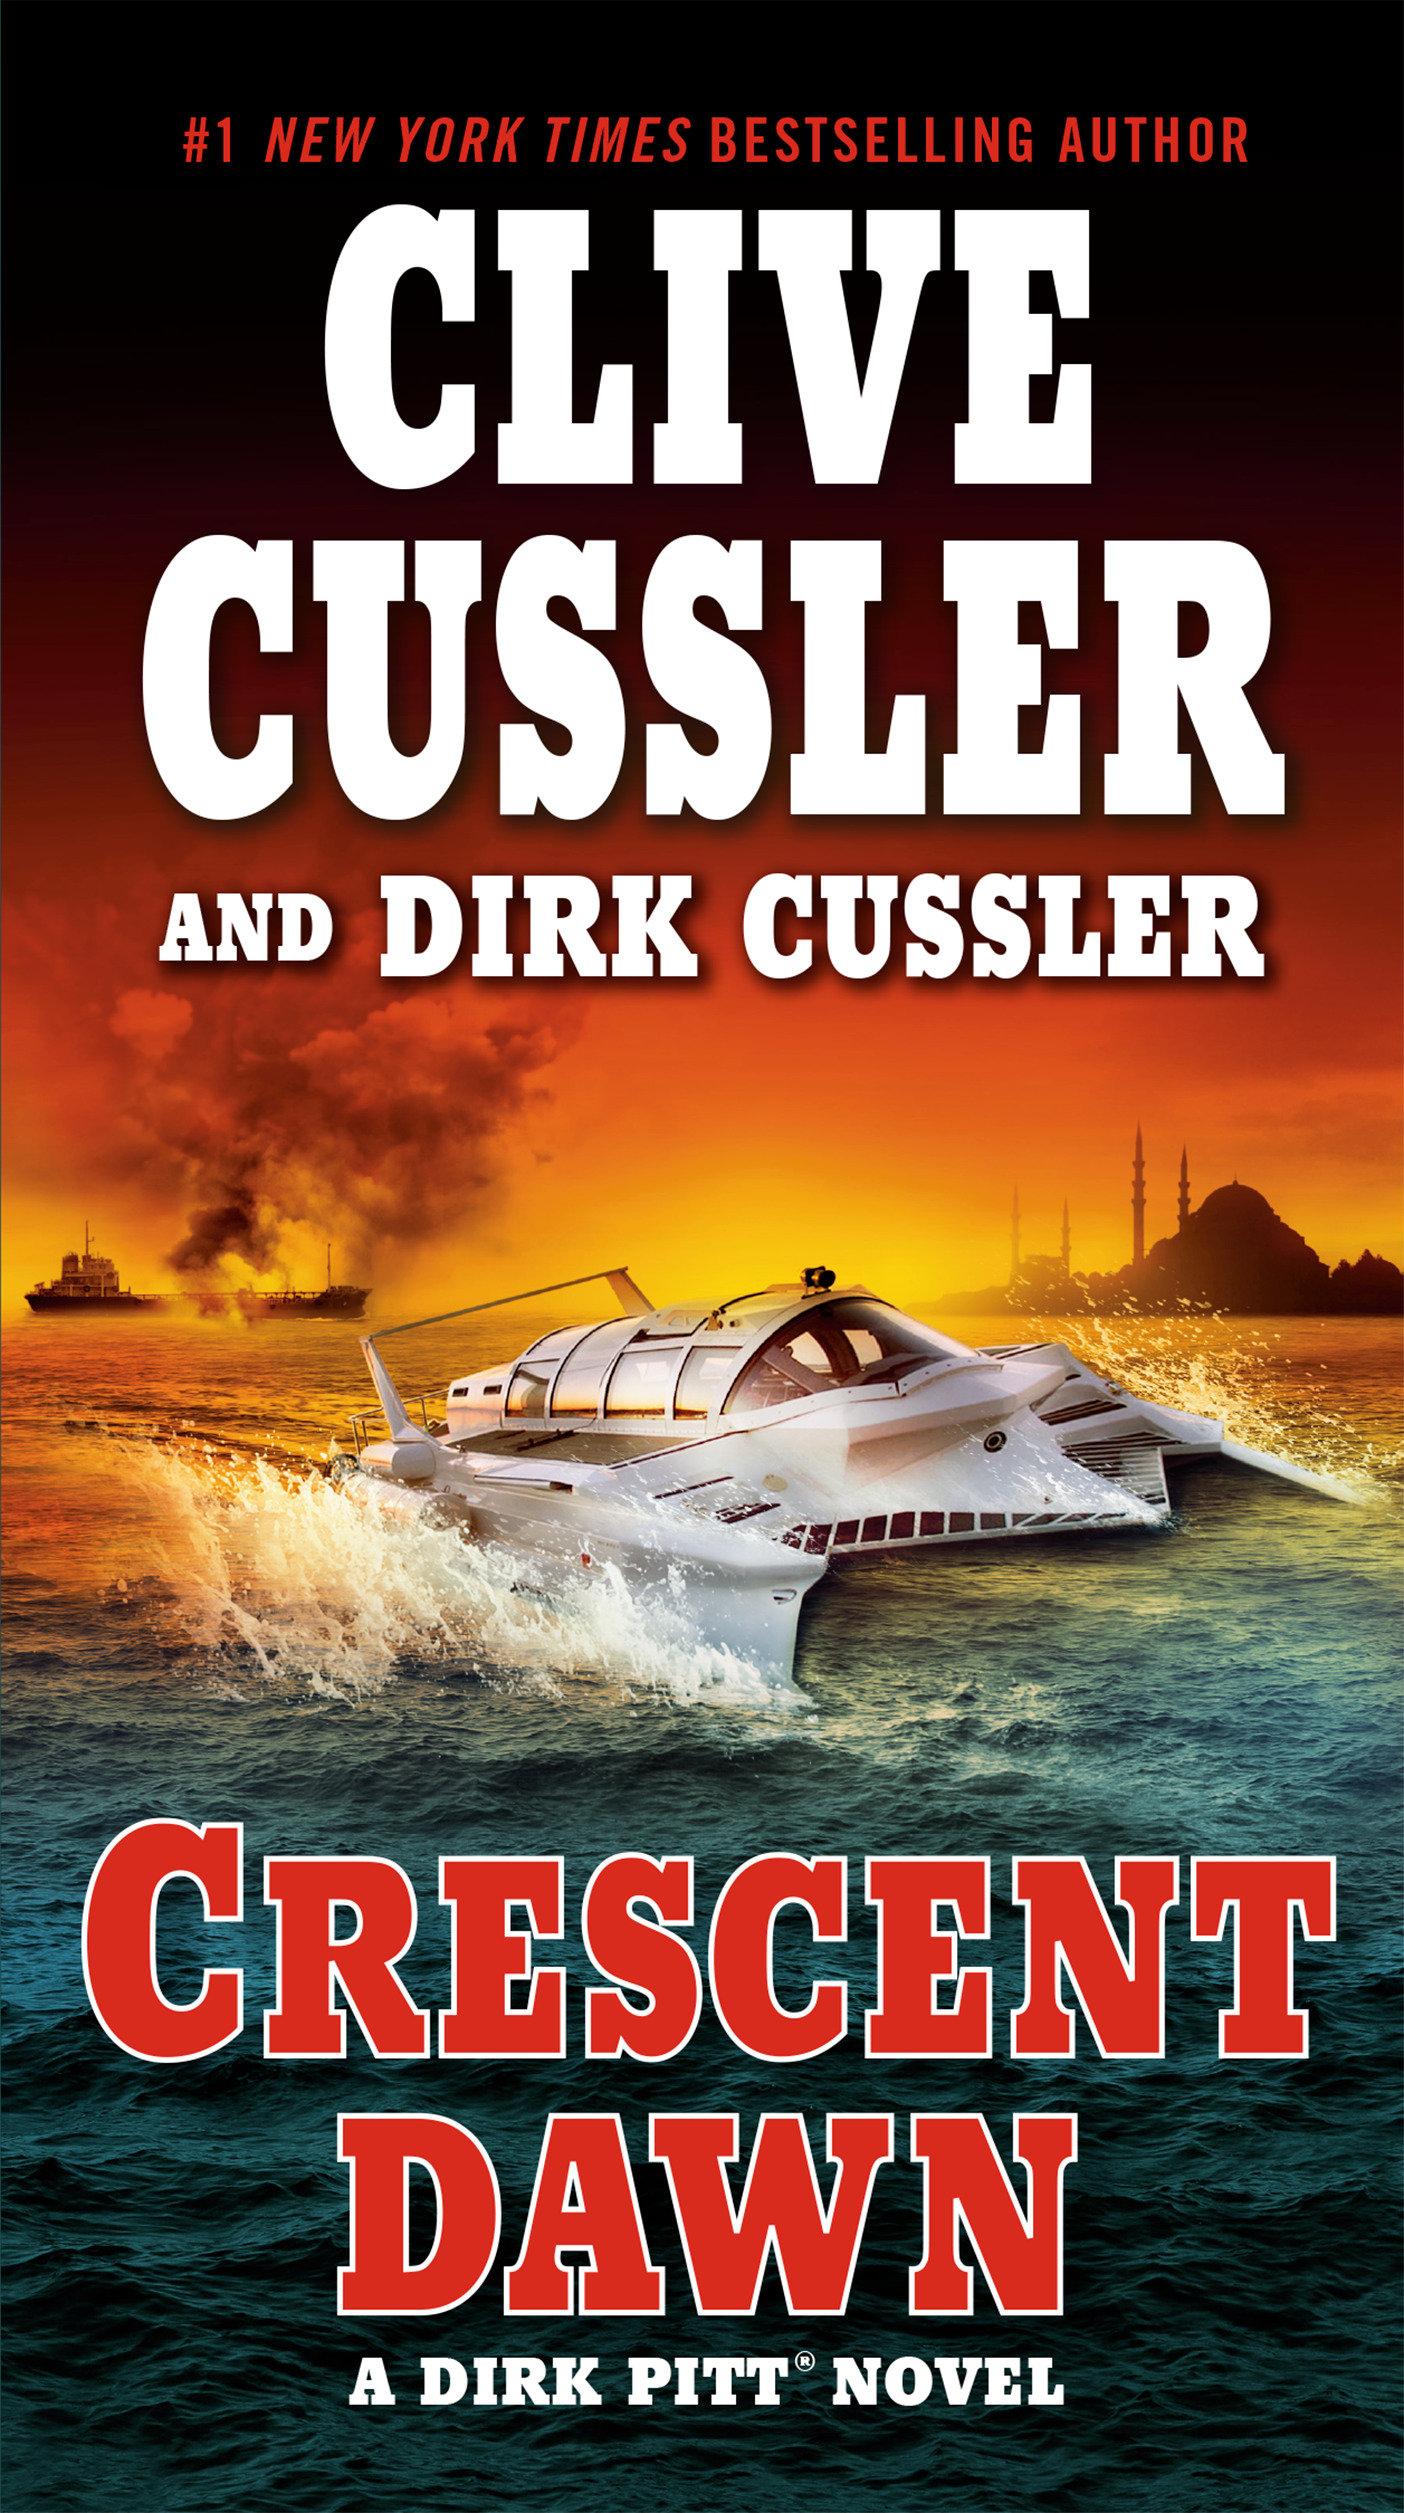 Crescent dawn cover image